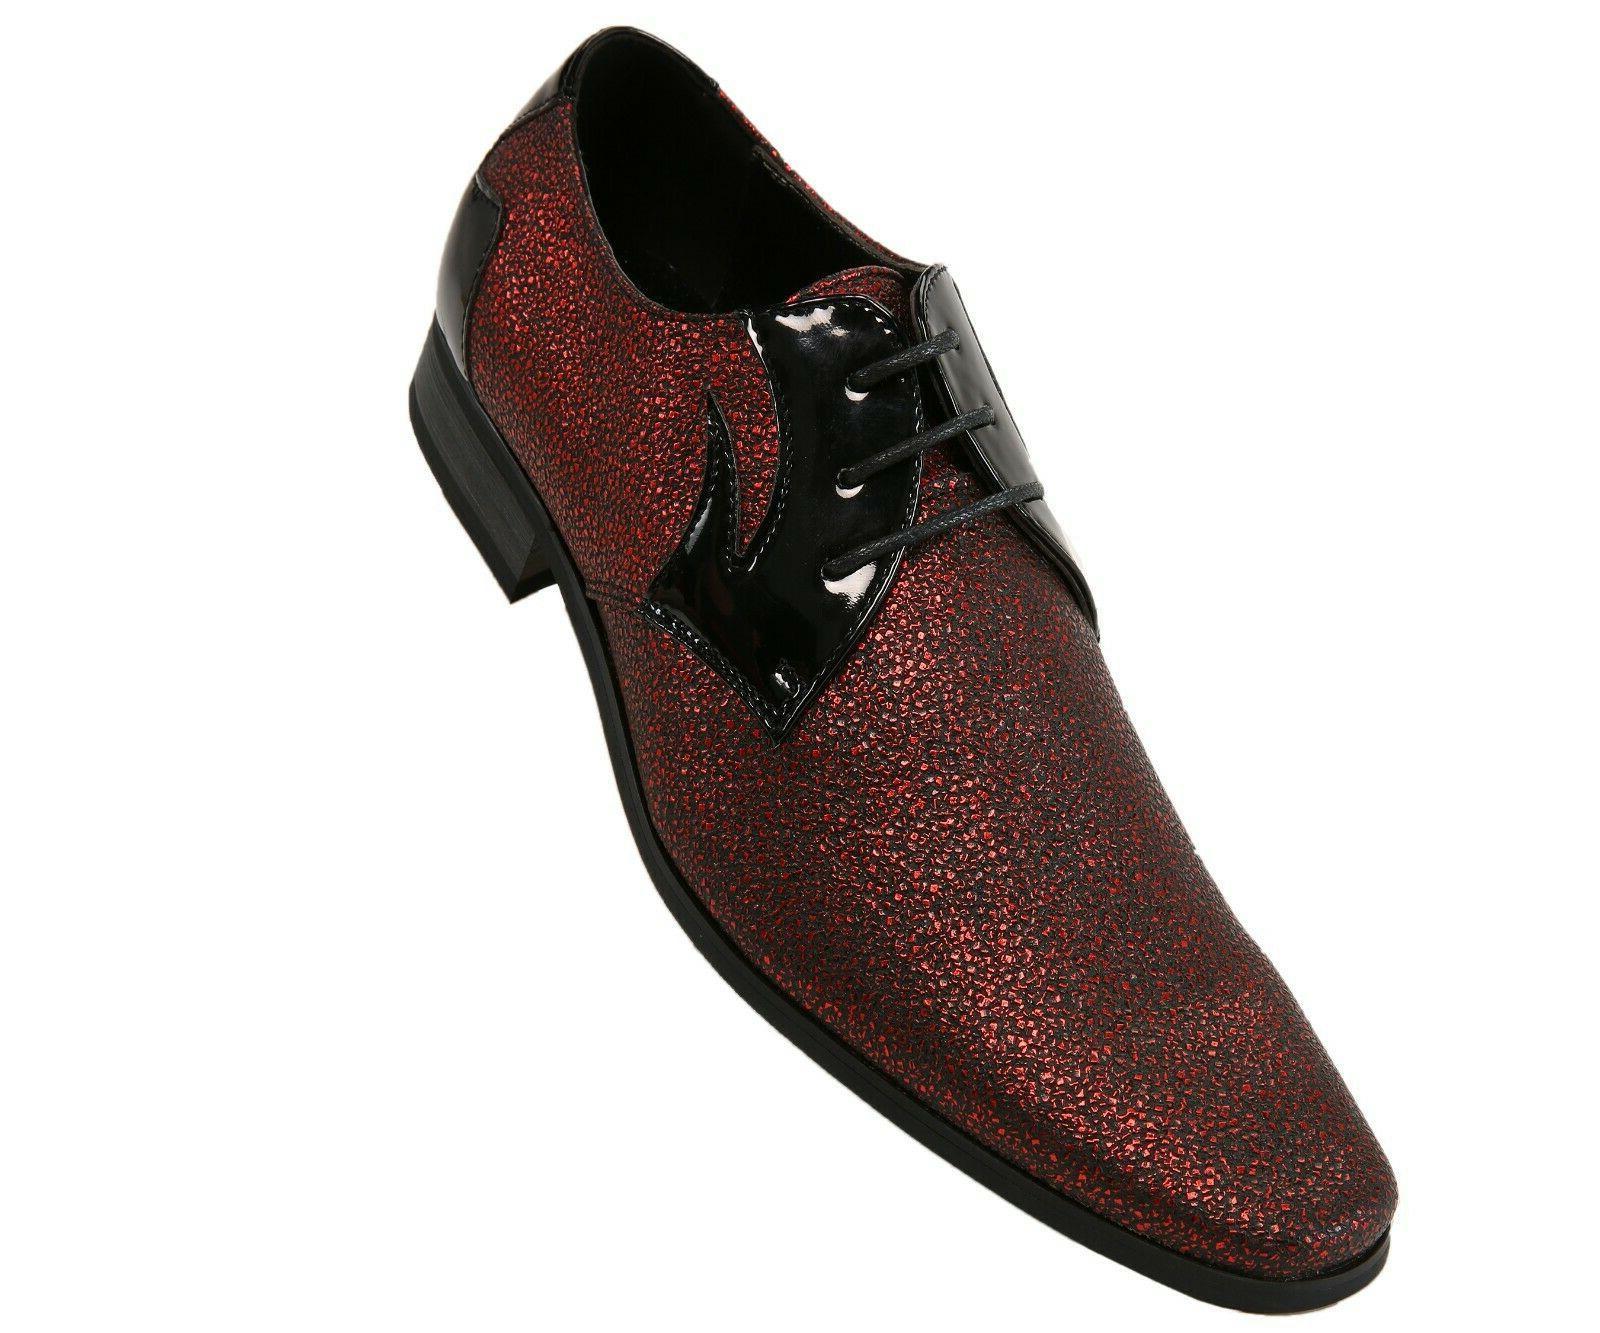 Amali Men's Metallic Red Speckled Oxford Tuxedo Dress Shoe S